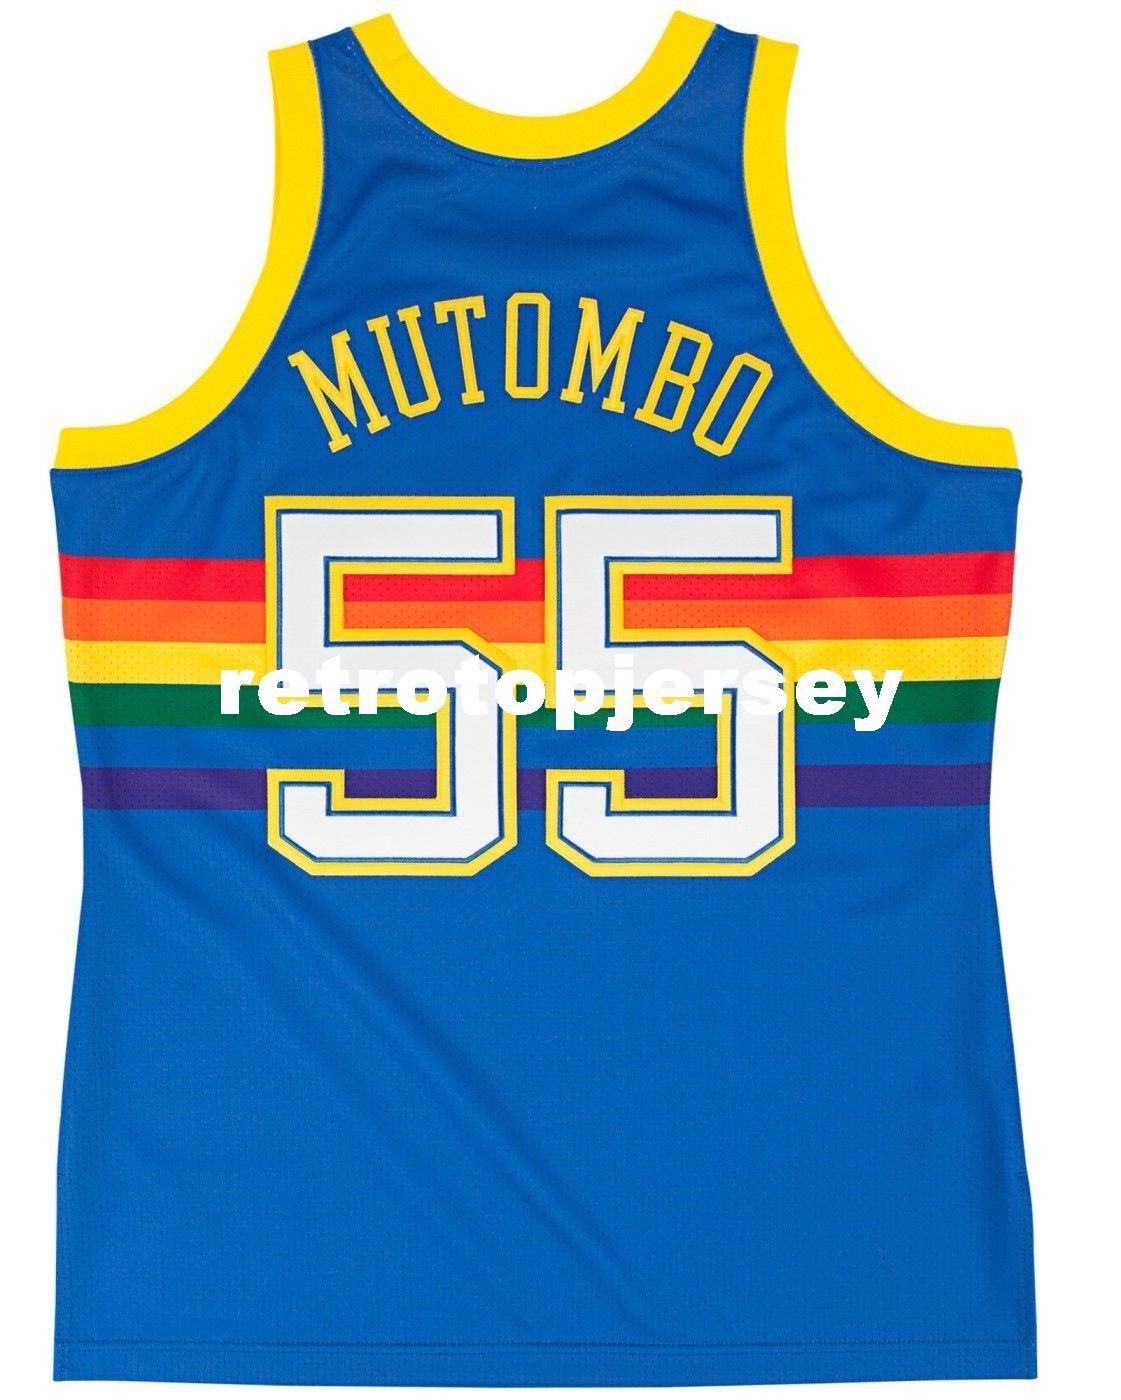 Dikembe Mutombo # 55 Cousu Mitchell Ness Top 1991 Bleu de haute qualité Jersey Hommes Taille Top XS-6XL Maillots De Basketball Surpiqués